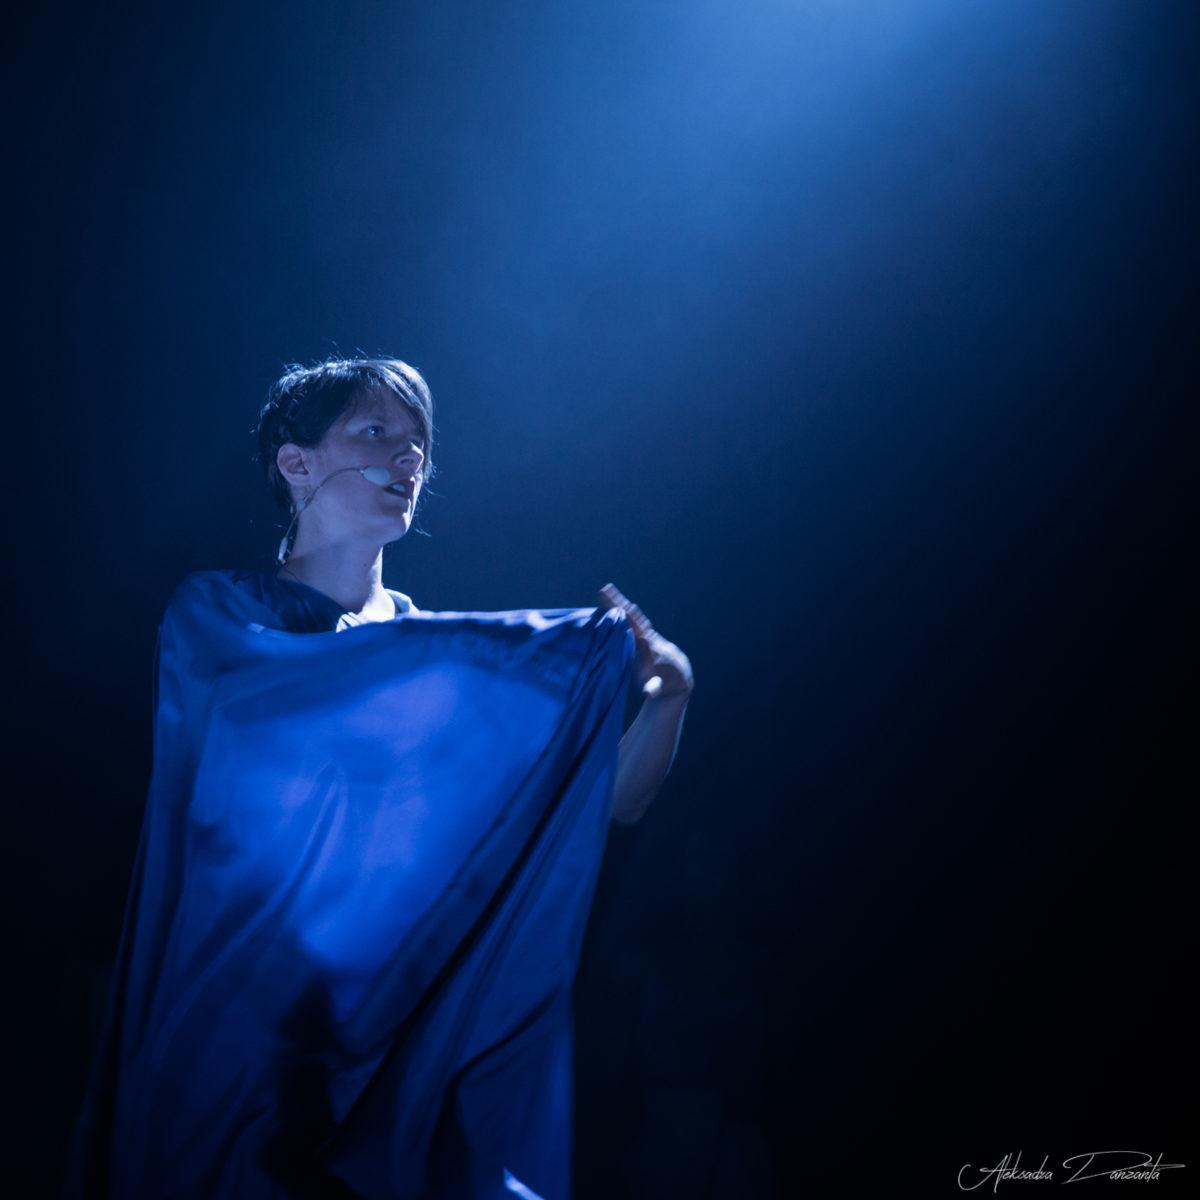 Camille-Nantes-Stereolux-Aleksadra Danzanta